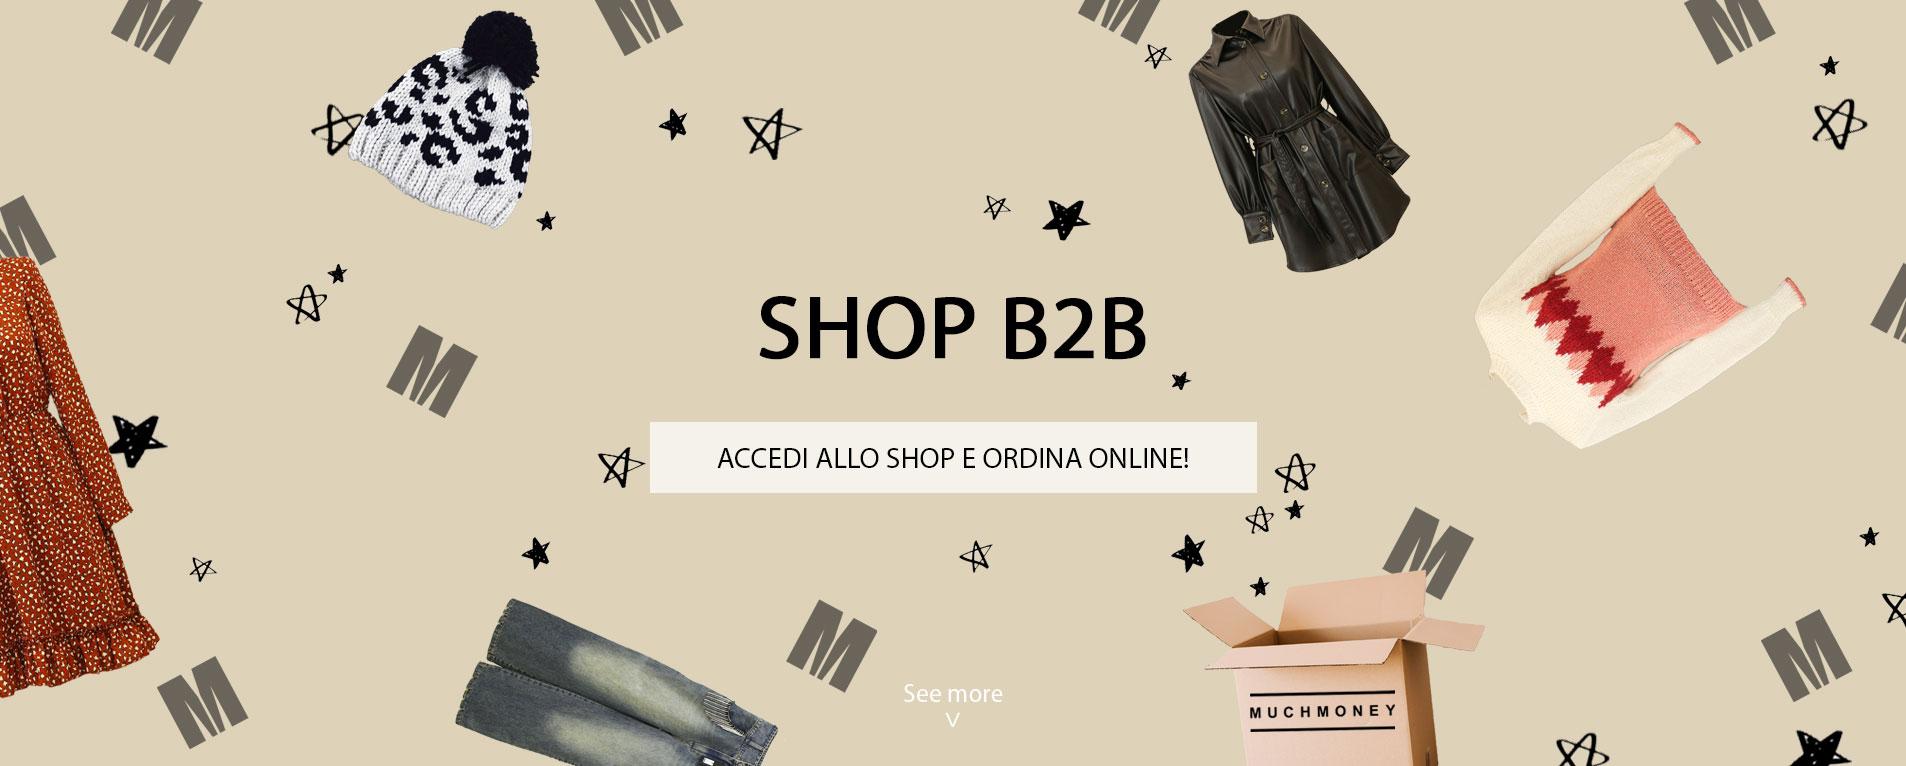 Accedi allo shop e ordina online